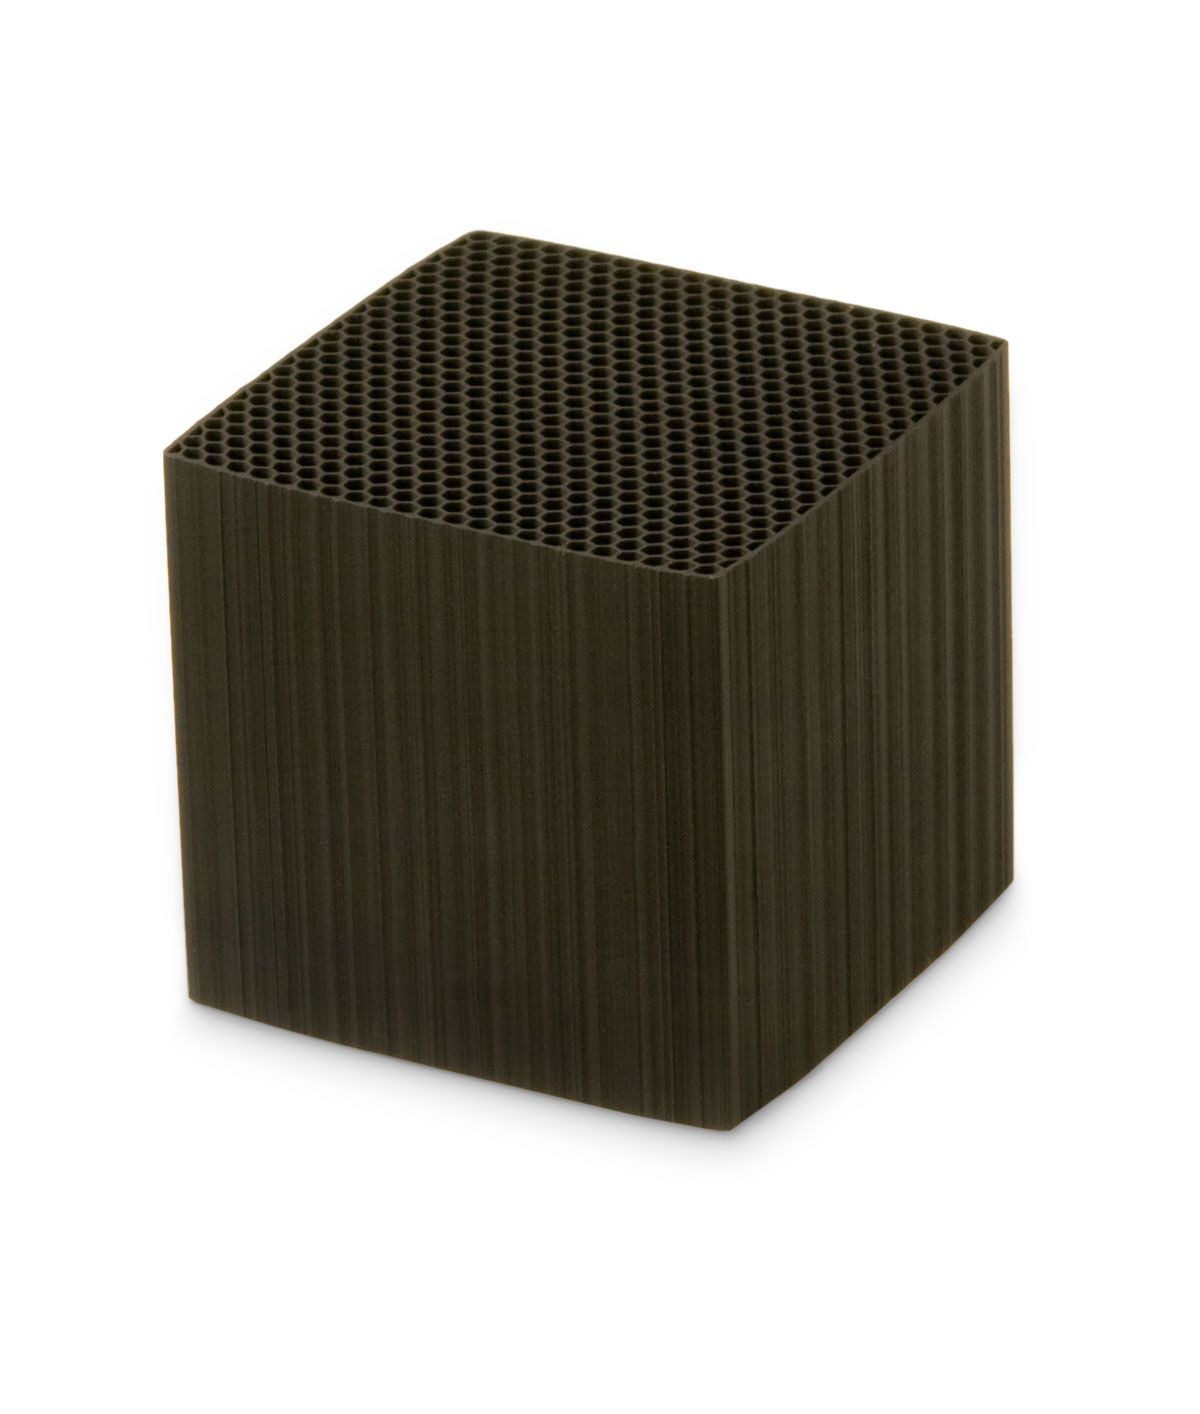 Chikuno Cube Air Freshener Odor Eliminator Filter